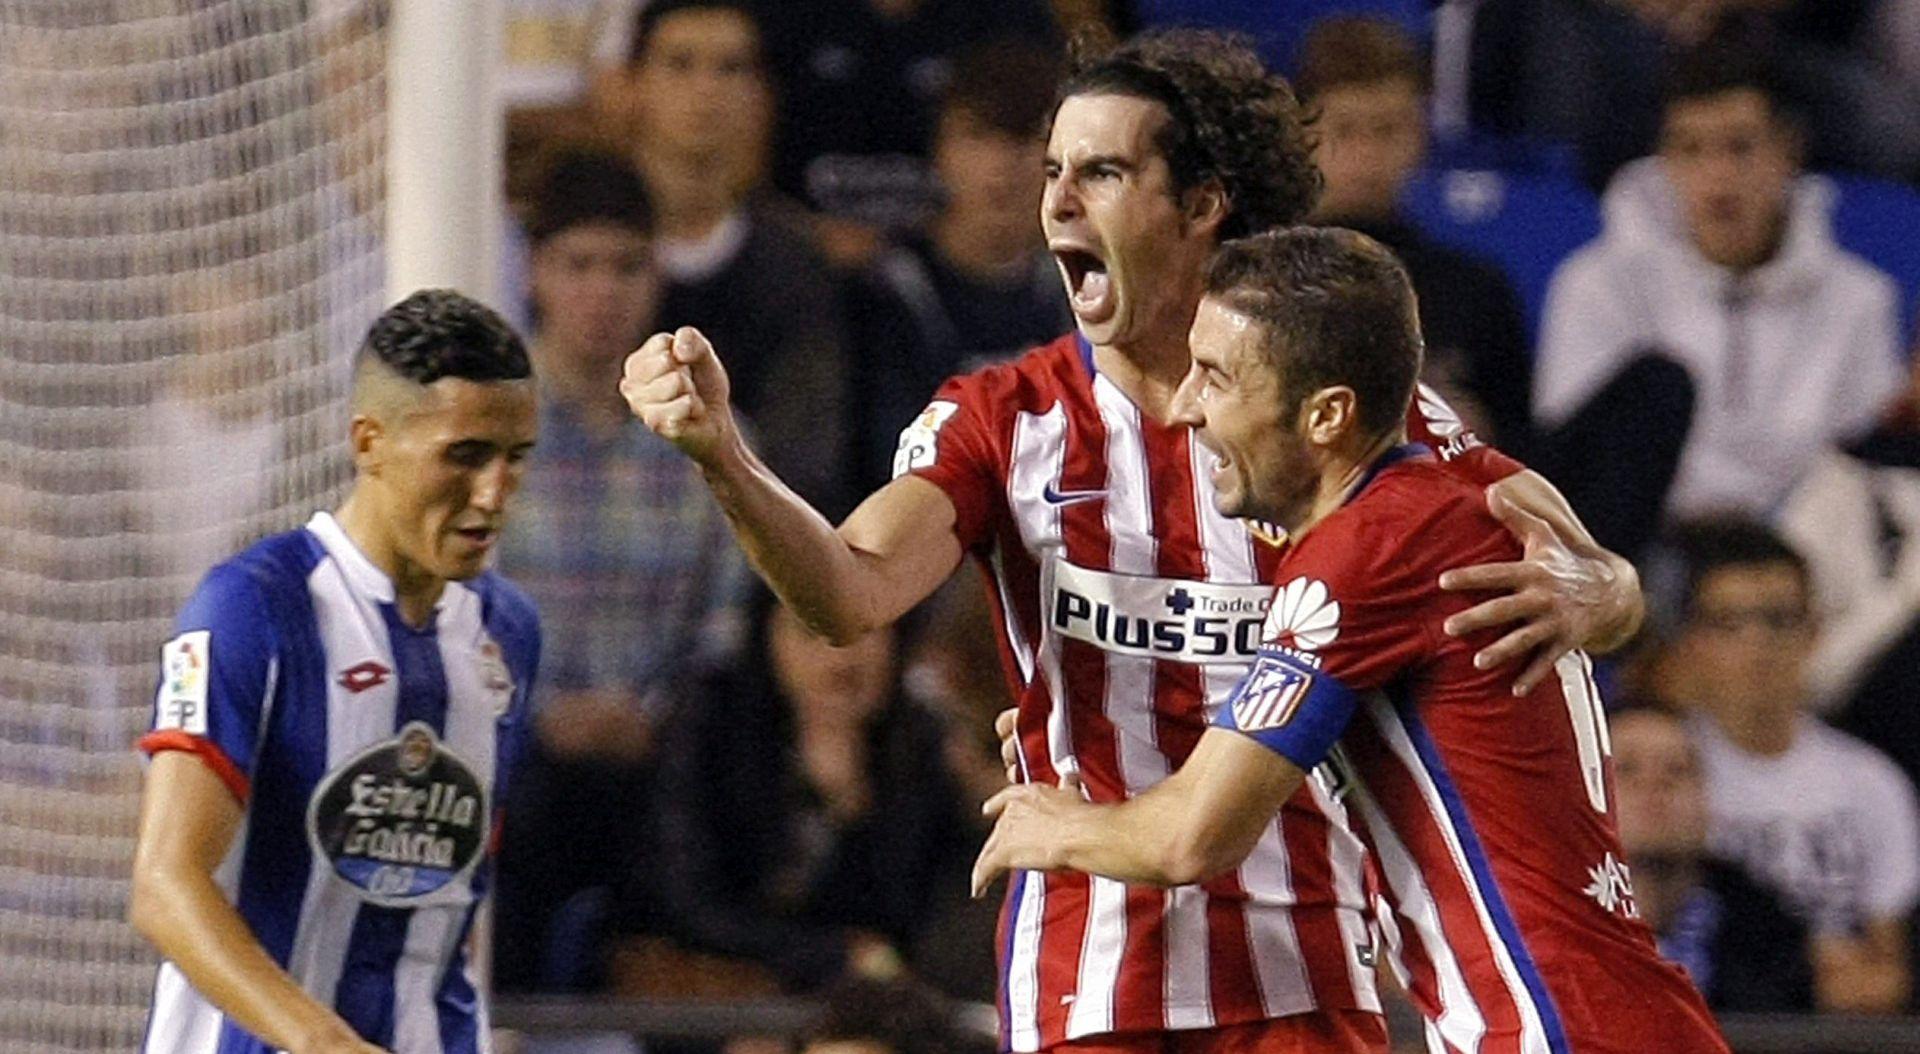 PRIMERA Atletico remizirao s Deportivom i propustio zasjesti na vrh ljestvice